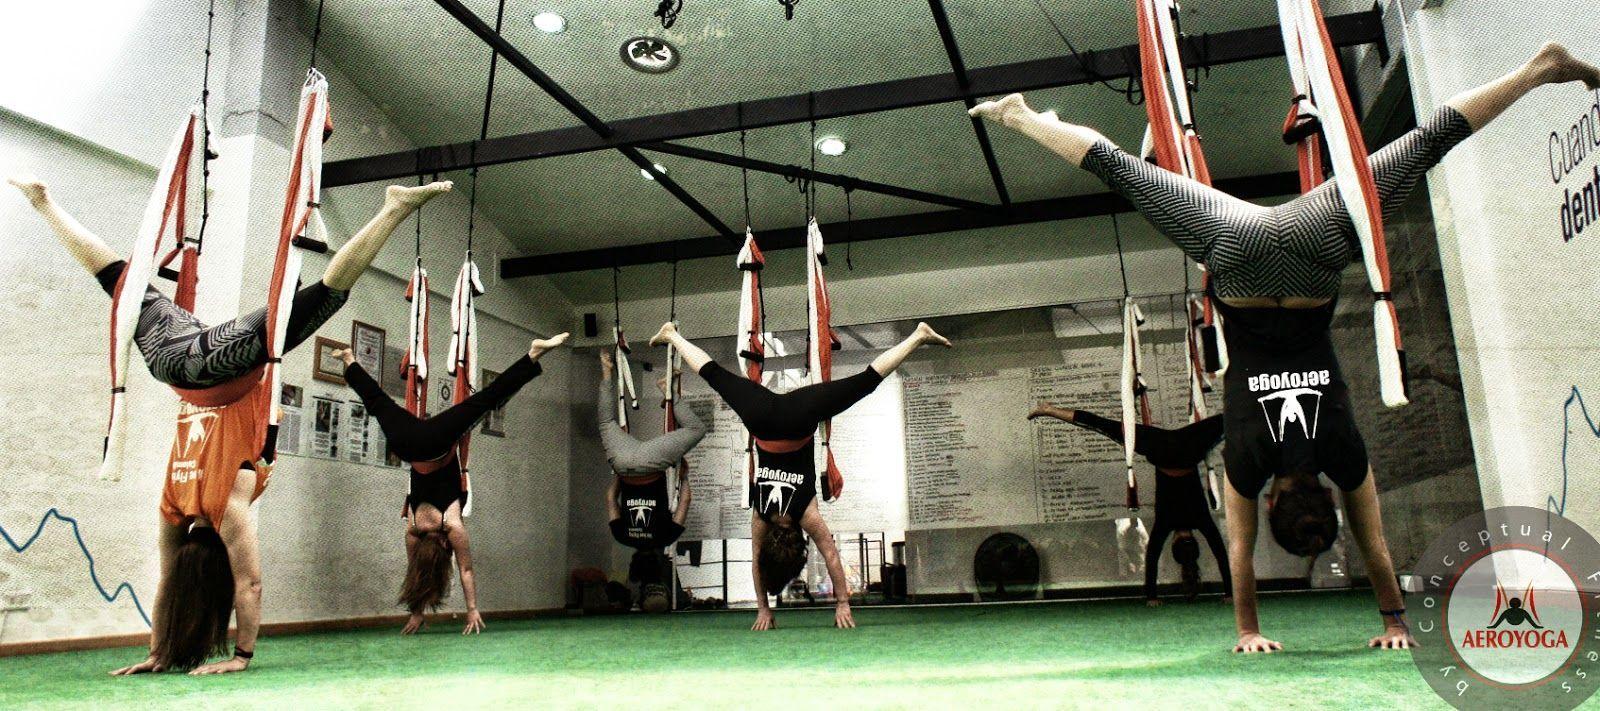 Pilates Aéreo, Aero PIlates, Aerien, Aerial Pilates by Rafael Martinez, #yOGA #Pilates #health #yogaswing #yogaaereo #pilatesaereo #deporte #wellness #bienestar #sante #bienetre #salud #POSE #rafaelmartinez #aereo #columpio #acrobático #courses #workshop #cursos #Teacherstraining #Sport #Aerial #silks #telas #benefits #beneficios #vaihayasa #pilatescourses Pilates Aéreo, Aero PIlates, Aerien, Aerial Pilates by Rafael Martinez, #yOGA #Pilates #health #yogaswing #yogaaereo #pilatesaereo #deport #pilatescourses